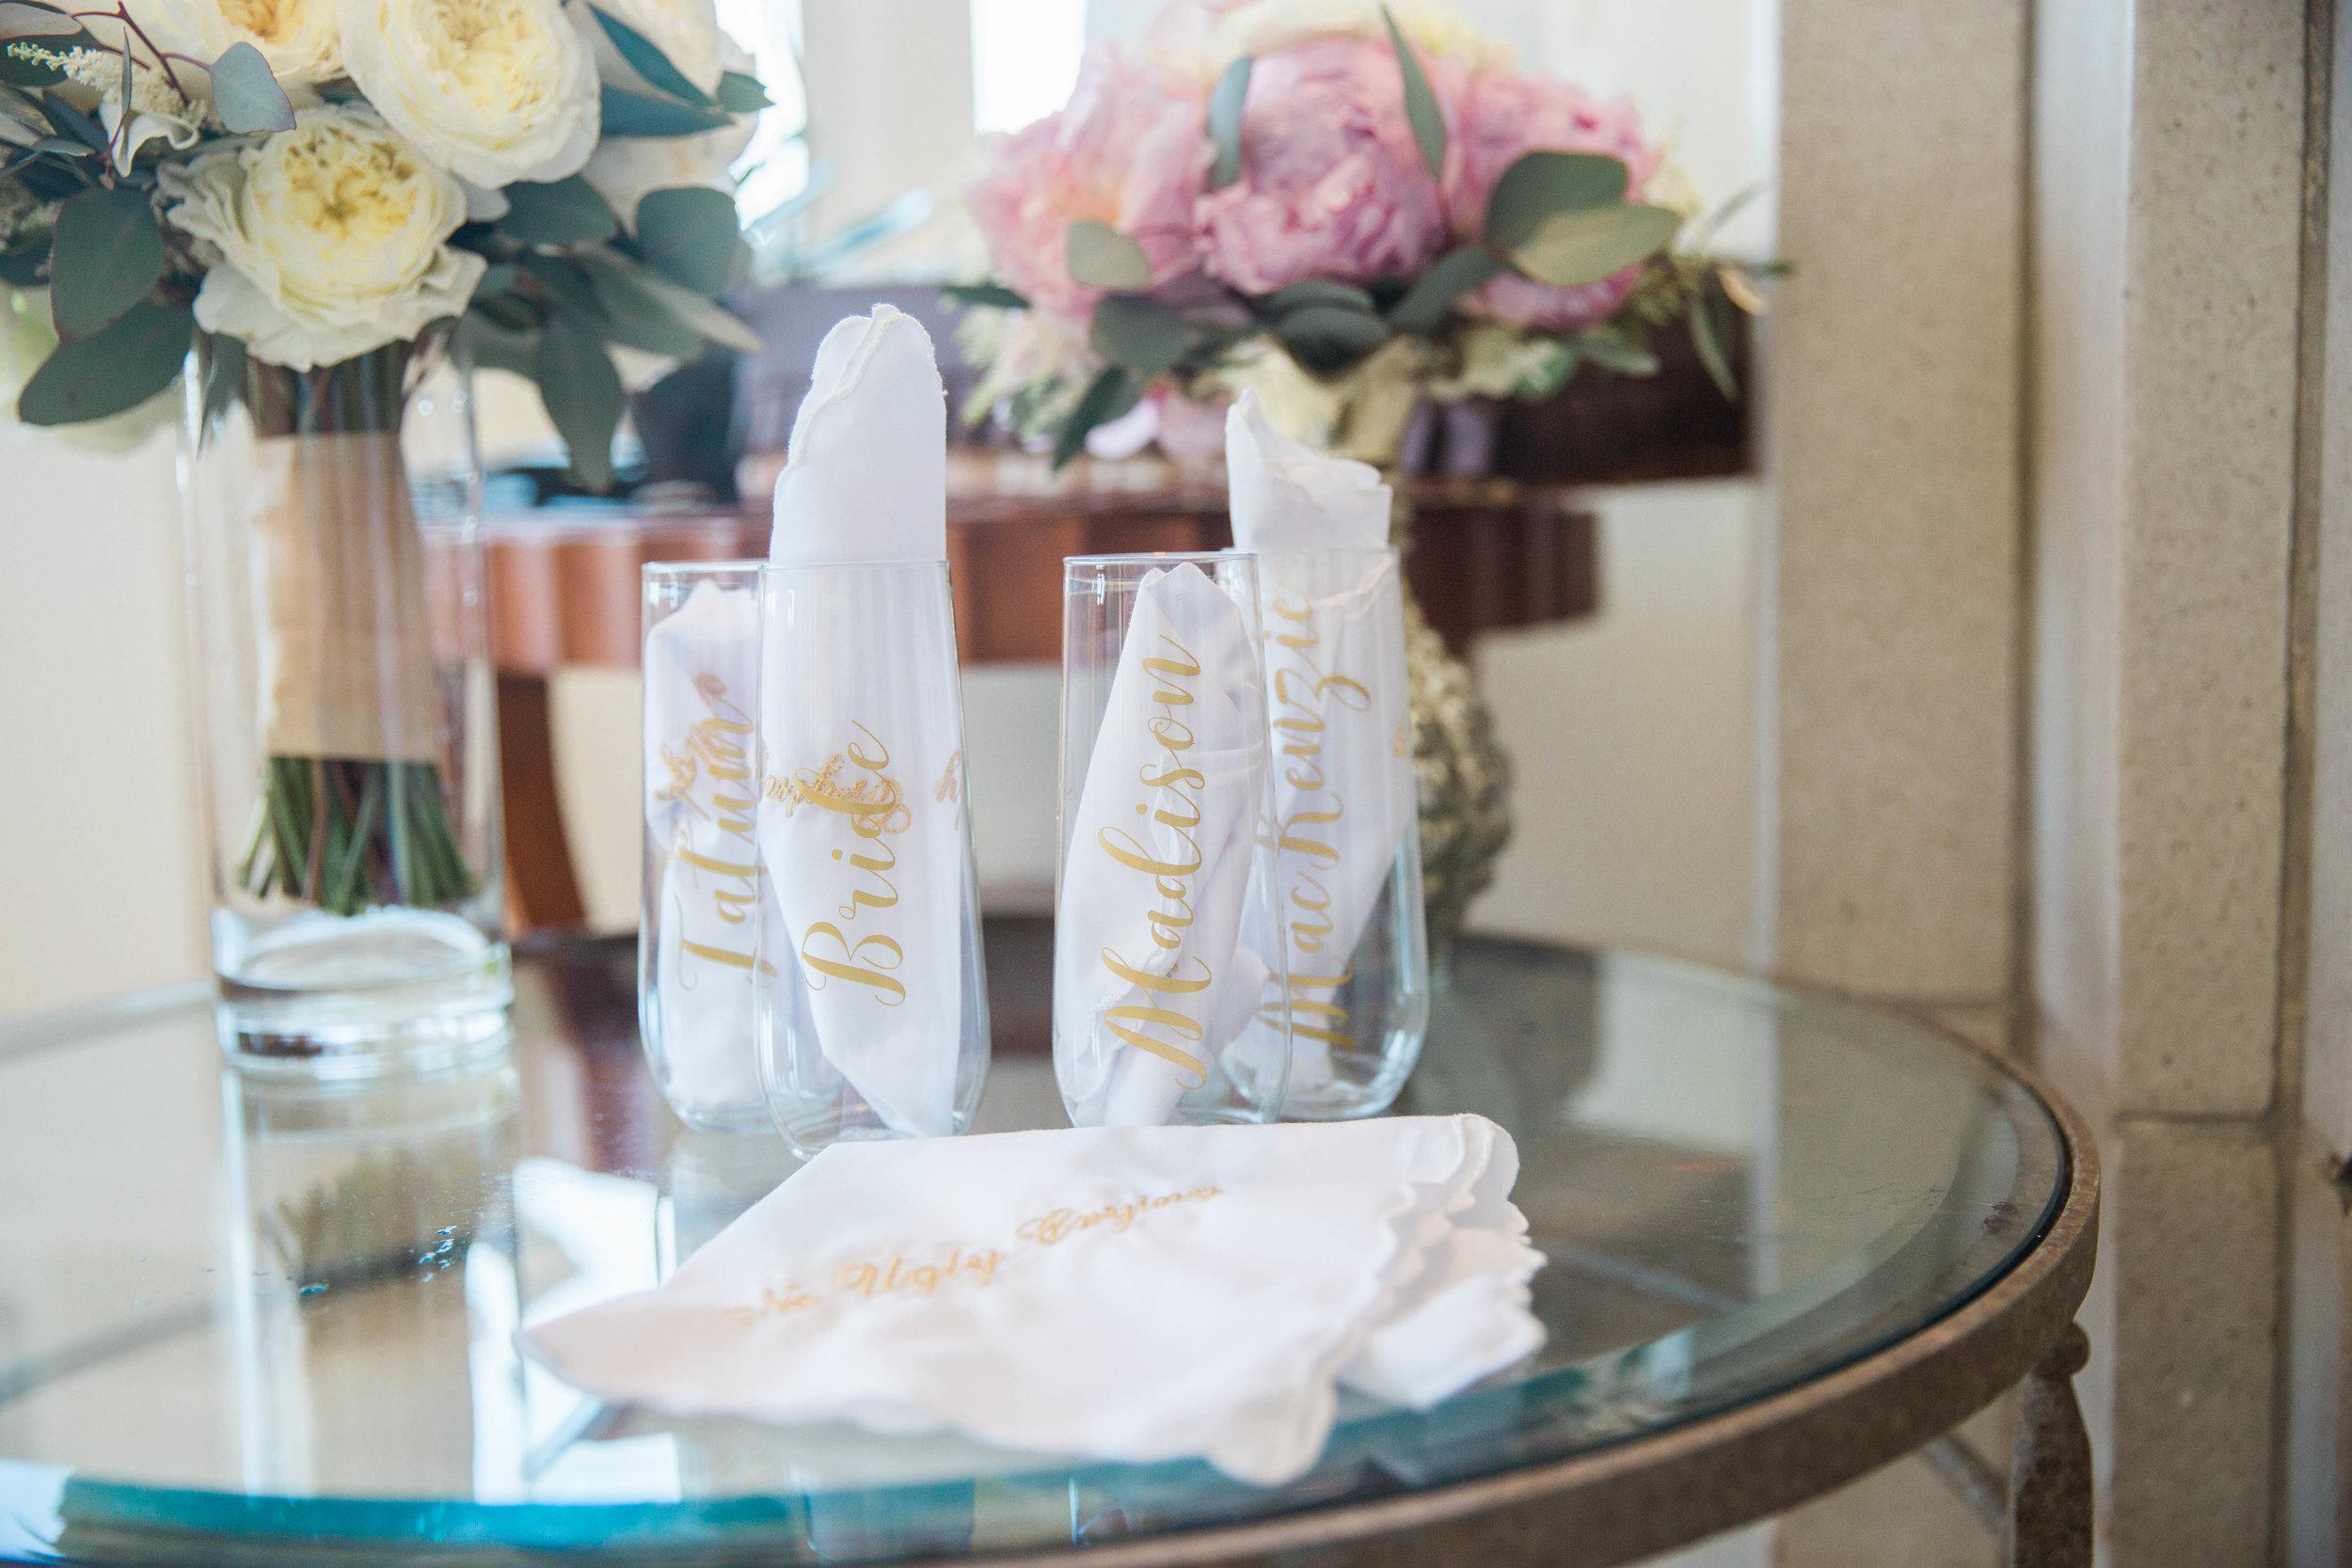 san-francisco-city-hall-wedding-kimberly-macdonald-photography110 copy.jpg